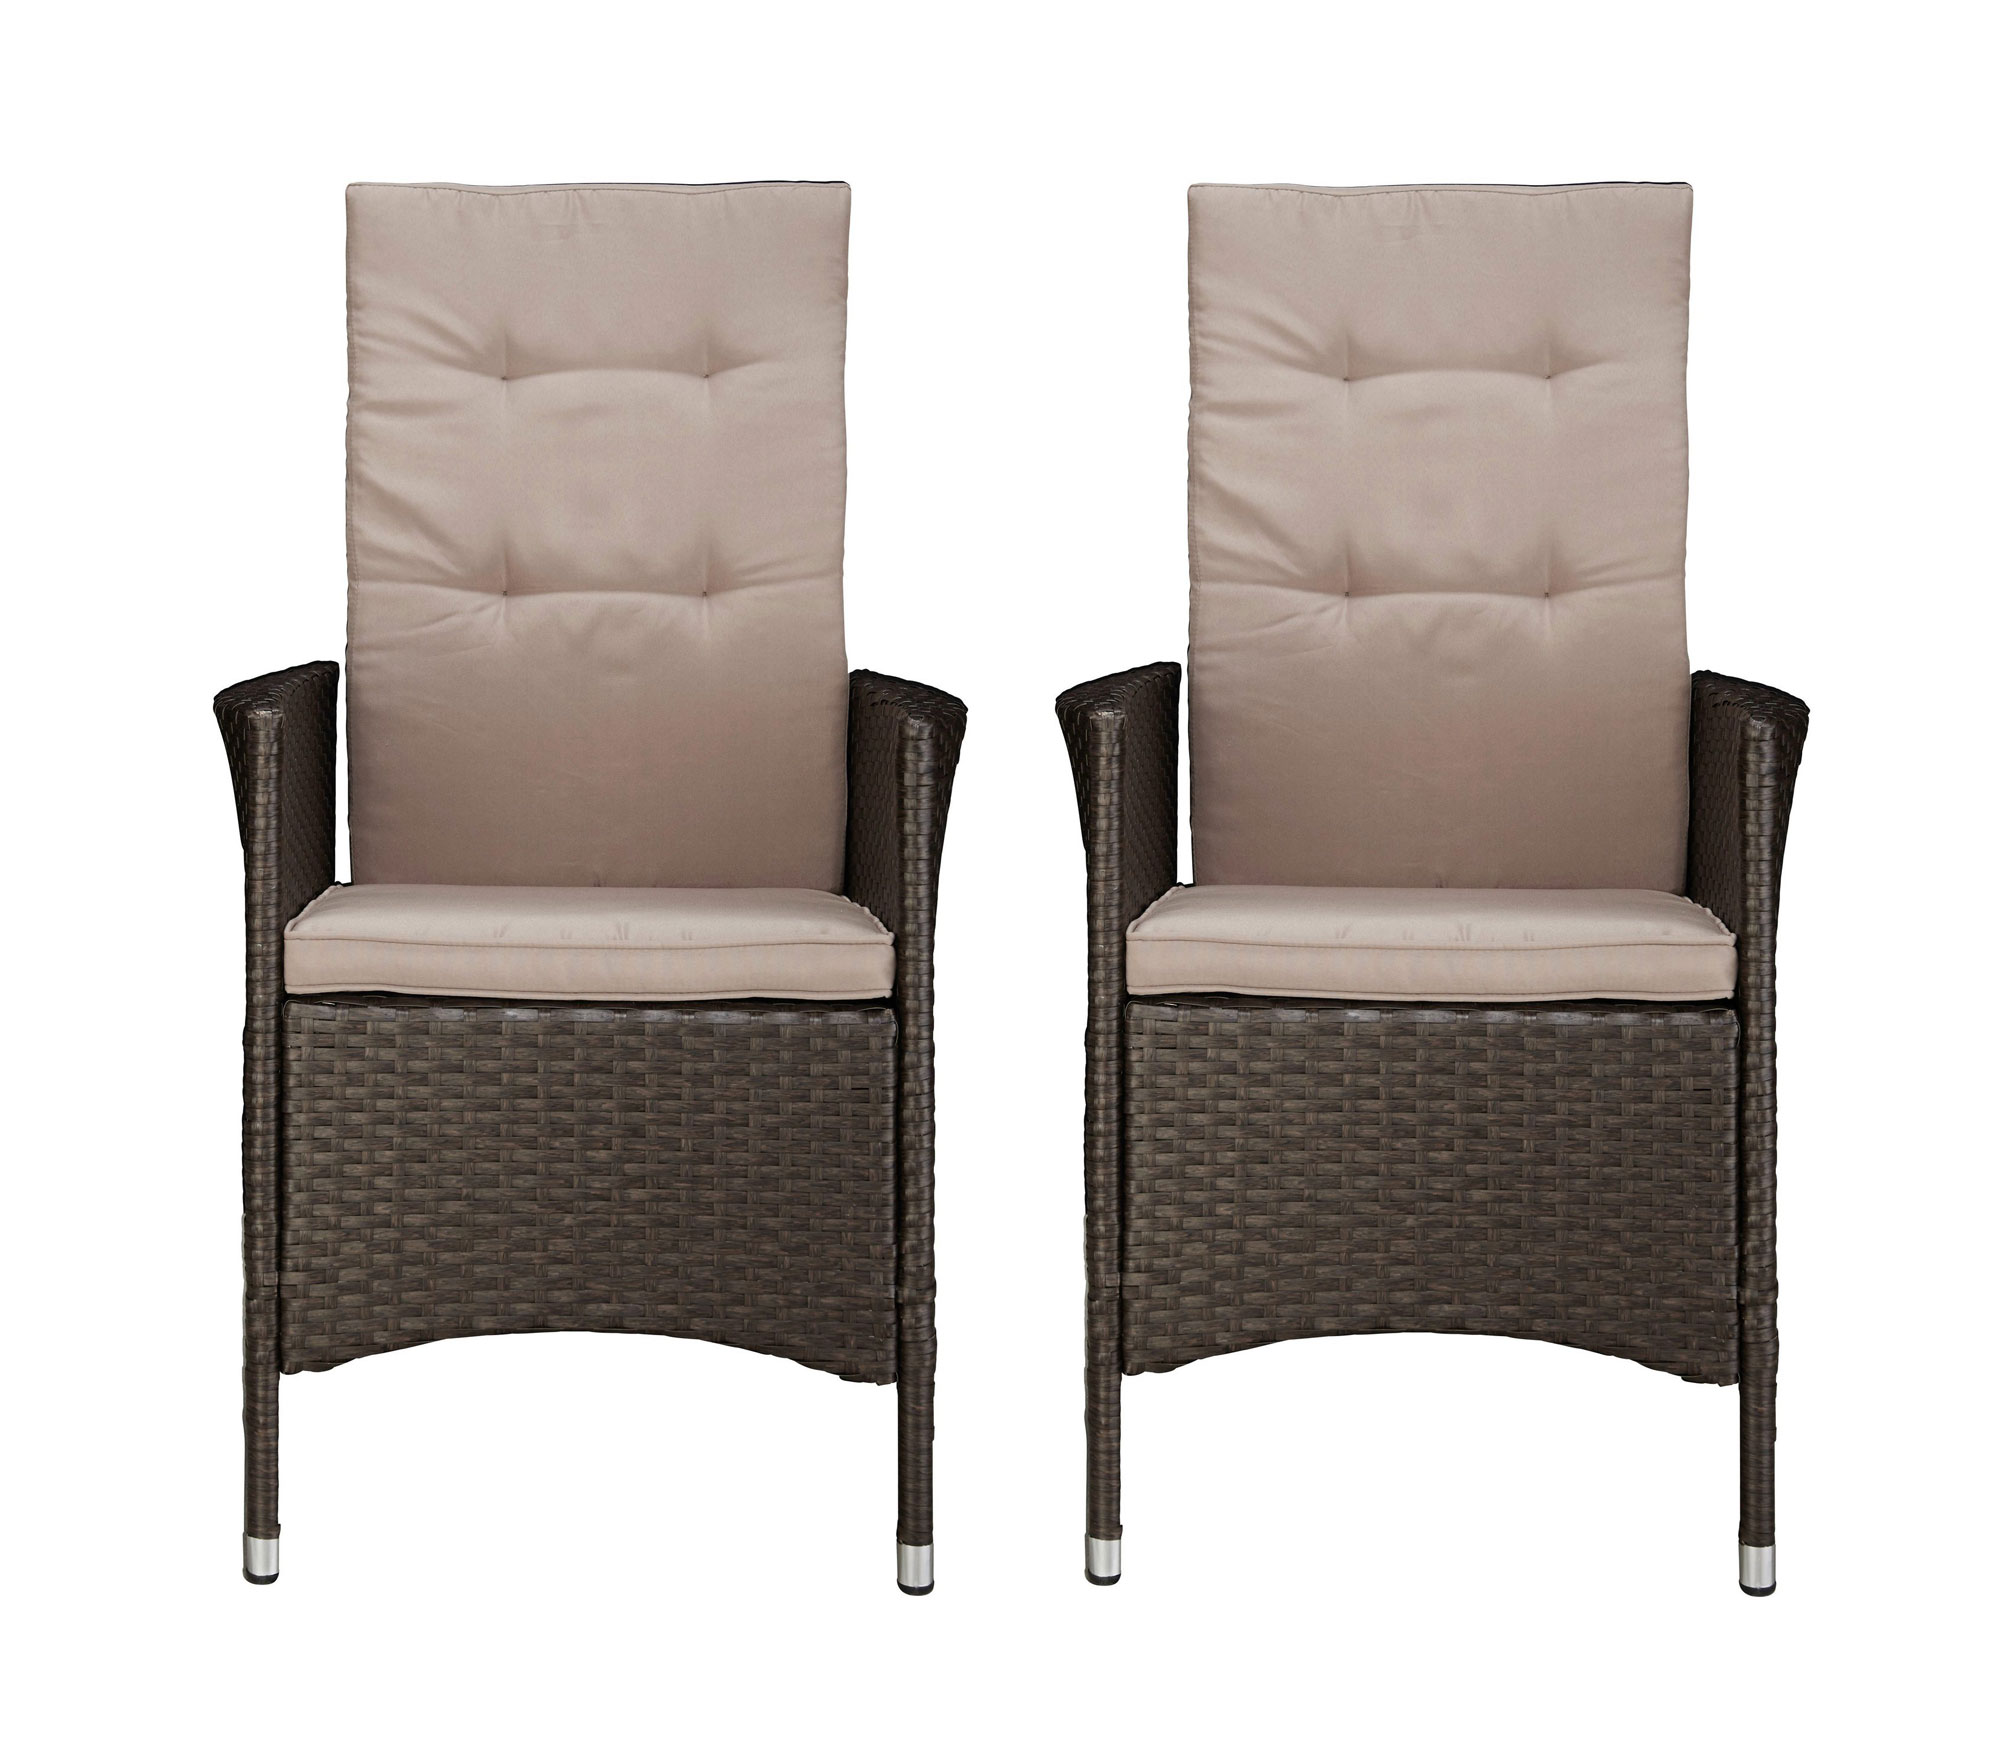 gartenst hle gartensessel st hle sessel 2 st ck polyrattan braun 7150386 ebay. Black Bedroom Furniture Sets. Home Design Ideas